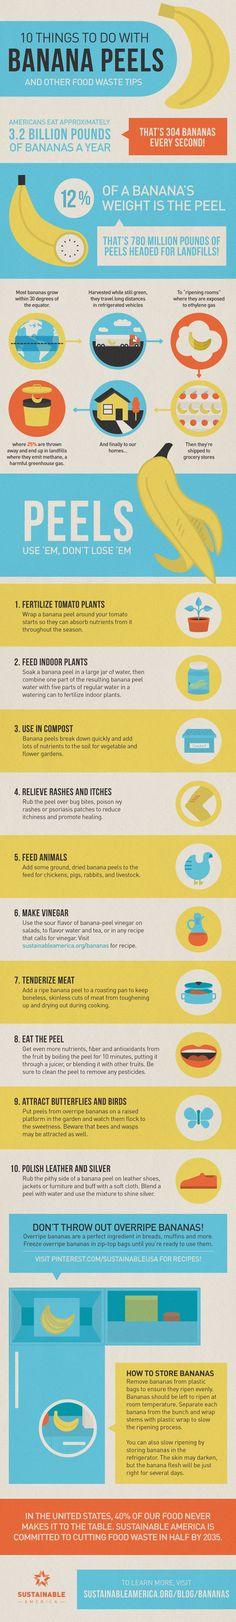 10 Ways to Use Banana Peels (INFOGRAPHIC)   Rodale News